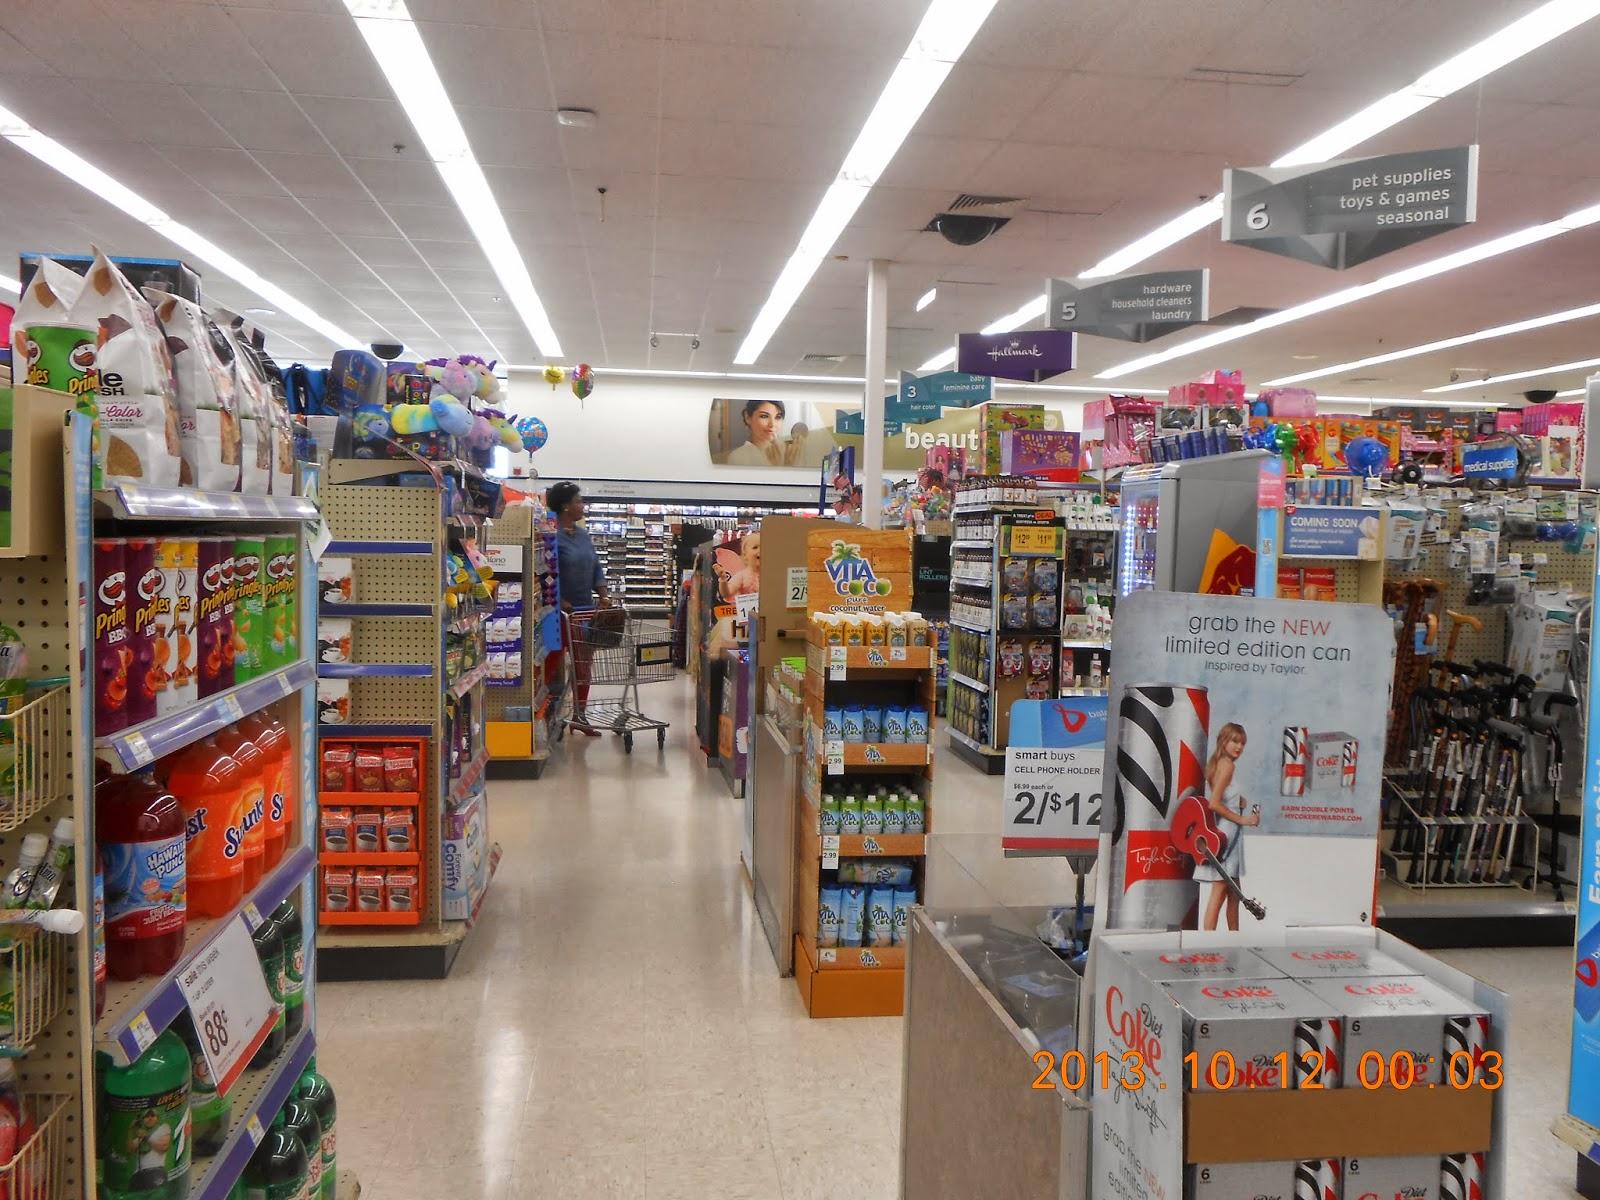 Cvs Store Pharmacy West Palm Beach Fl